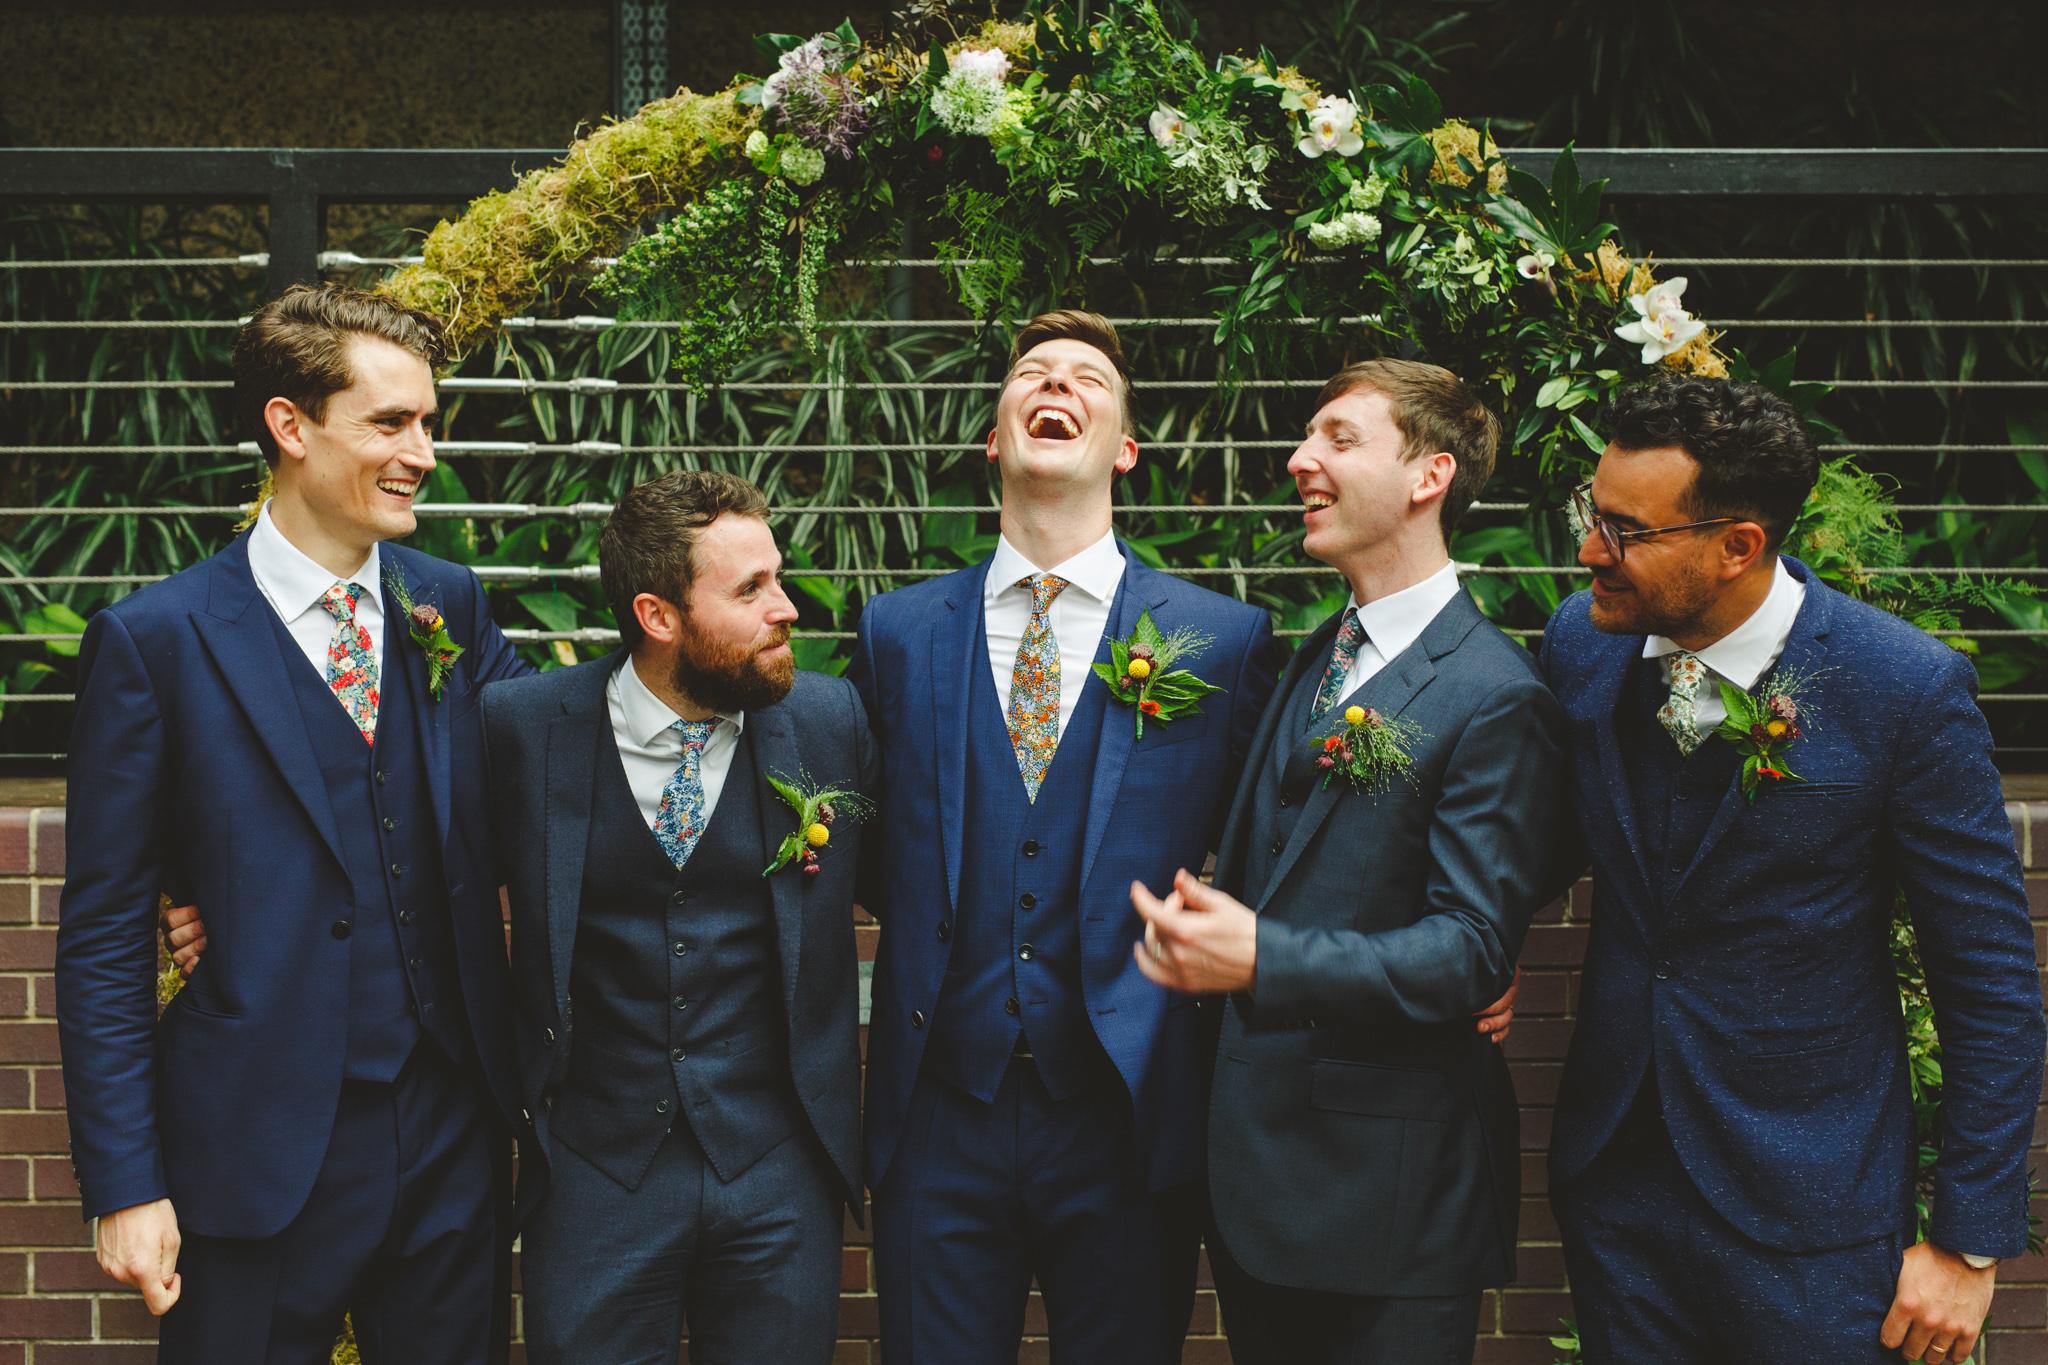 derby-wedding-photographer-camera-hannah-blog-137.jpg